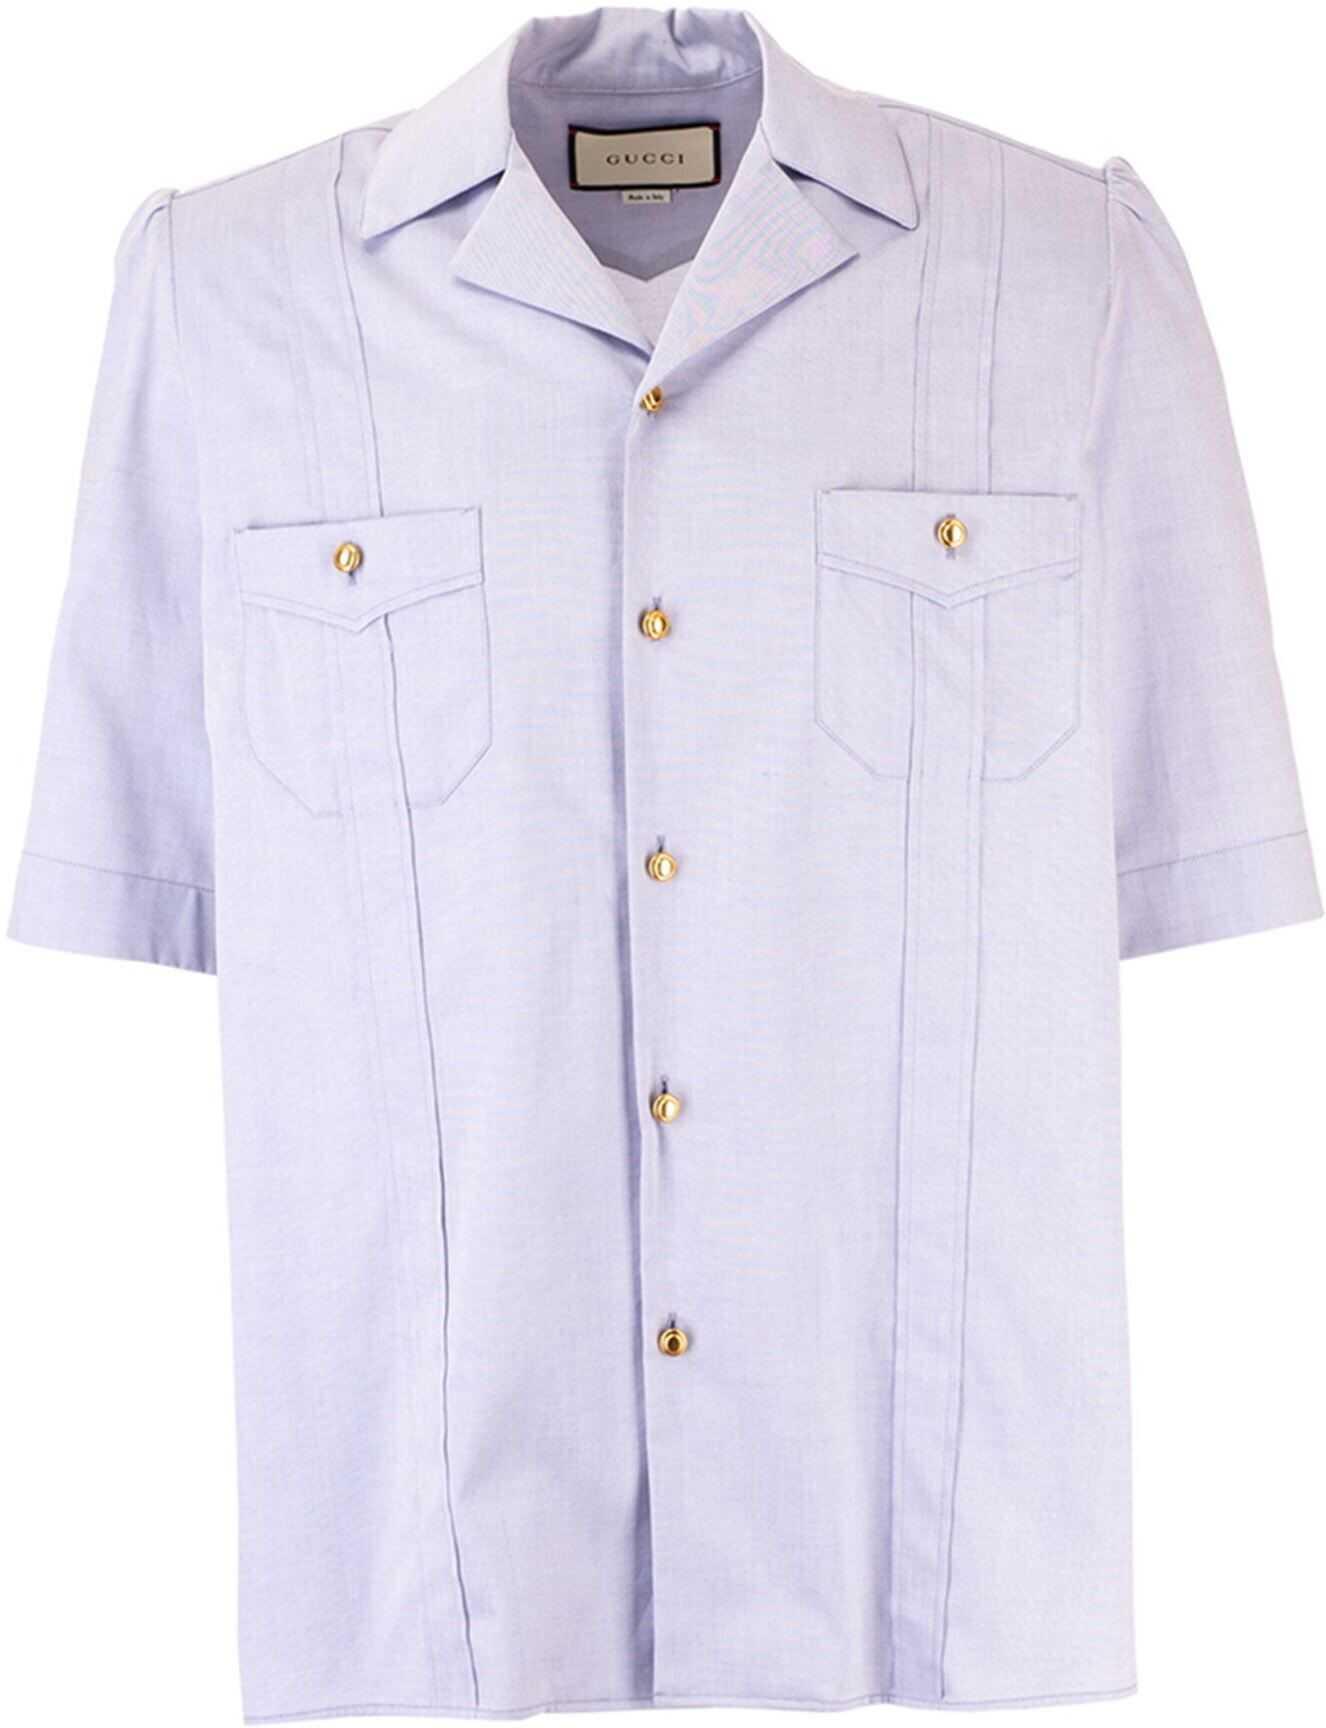 Gucci Short Sleeve Oxford Shirt In Light Blue Light Blue imagine